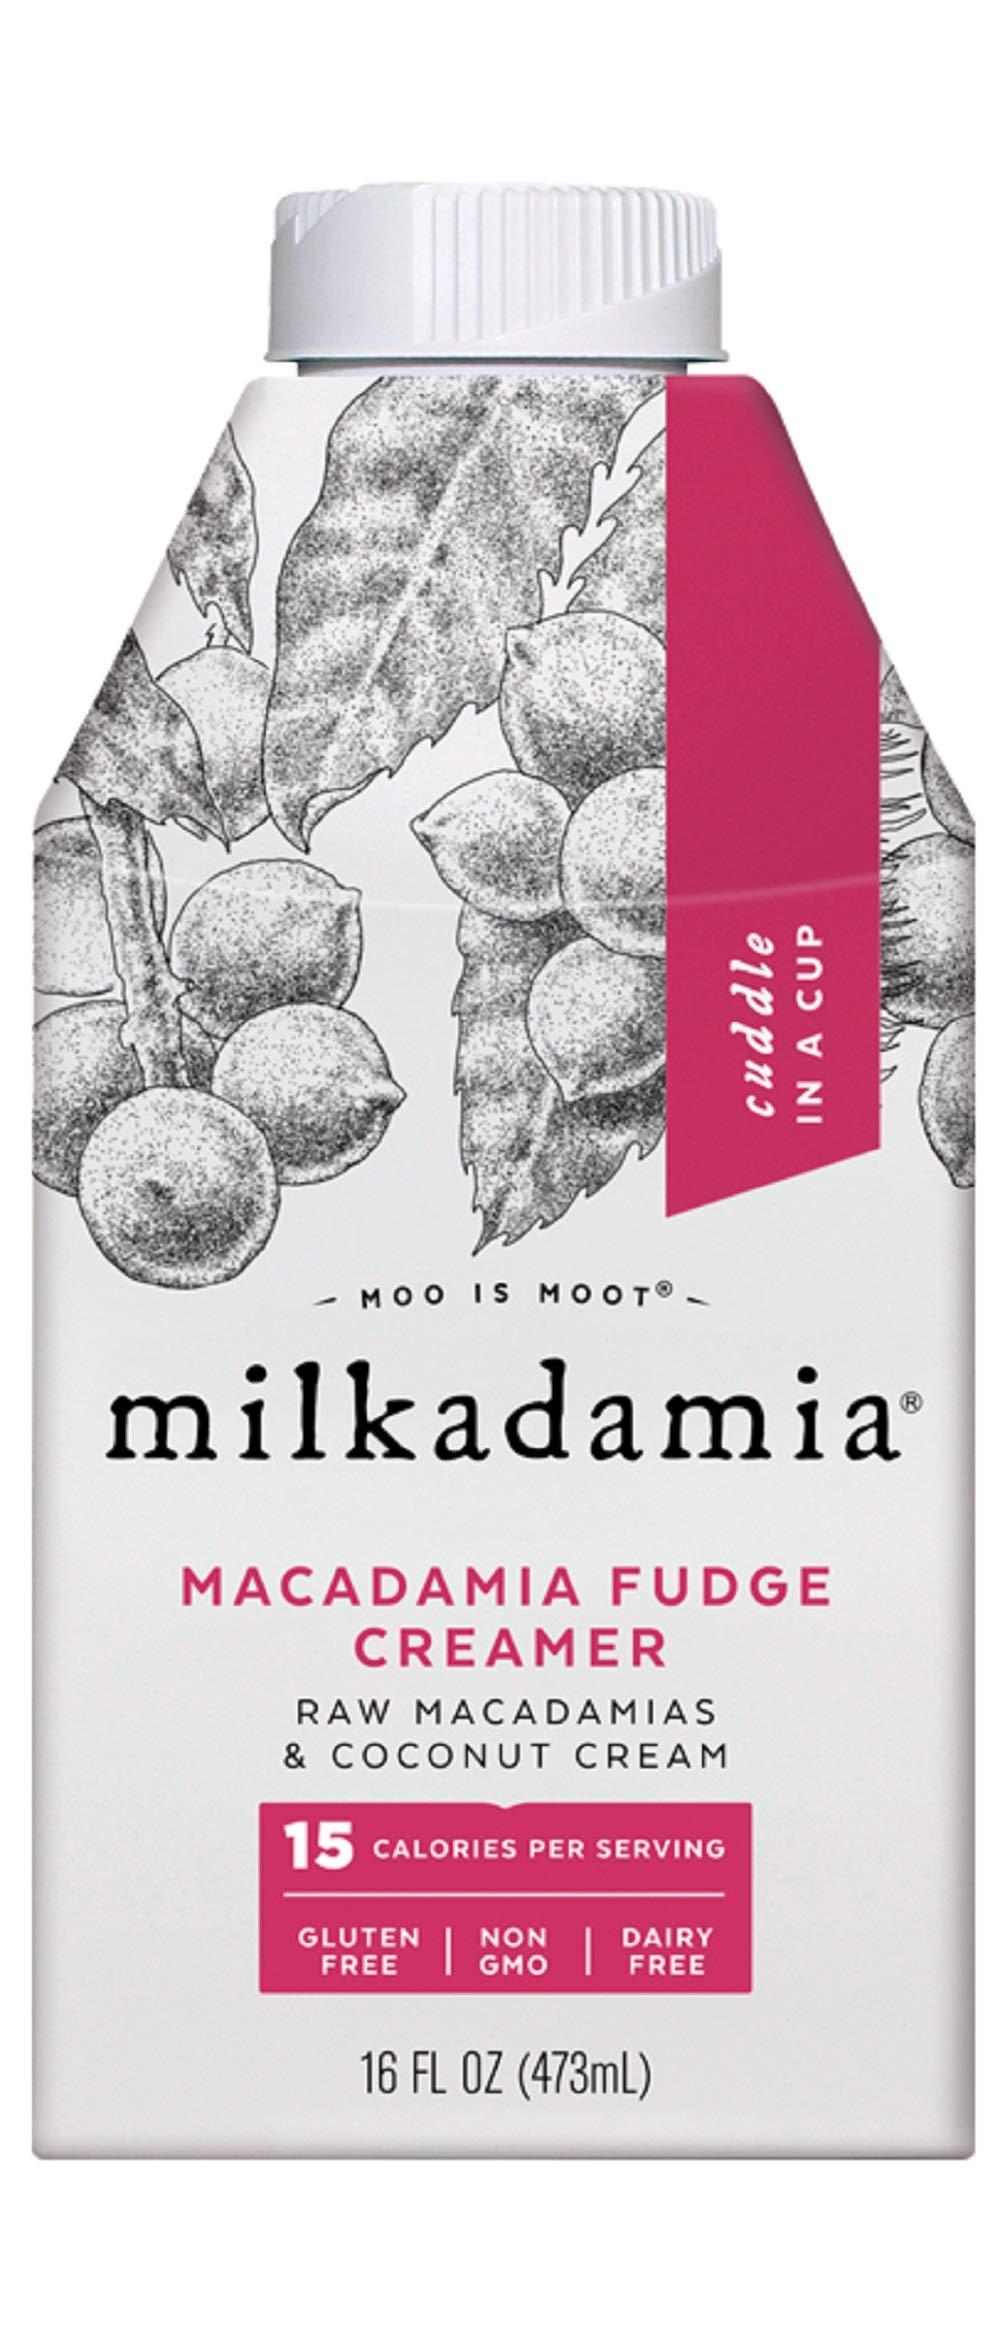 Milkdamia Macadamia Fudge Creamer With Raw Macadamias & Coconut Cream,, 16 Fl Oz (pack Of 6)